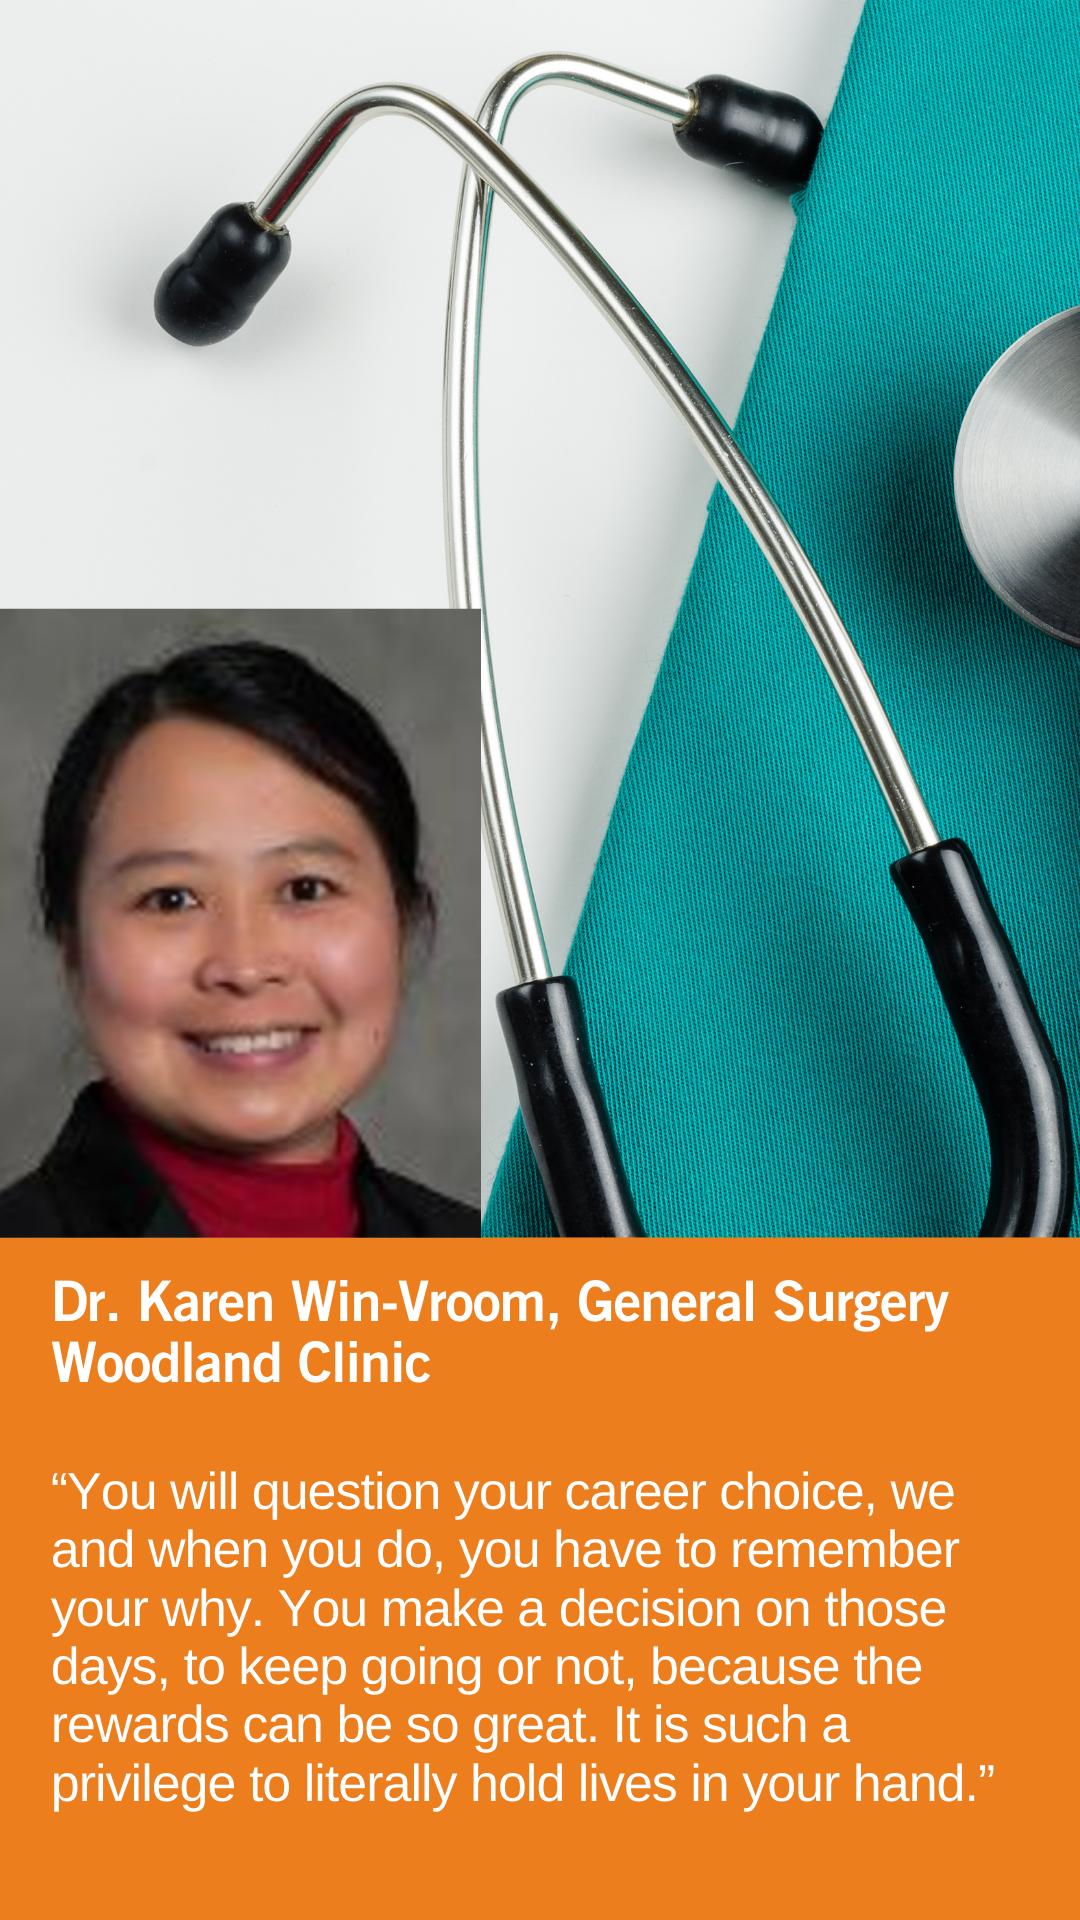 Karen Win-Vroom, MD, General Surgery, Woodland Clinic